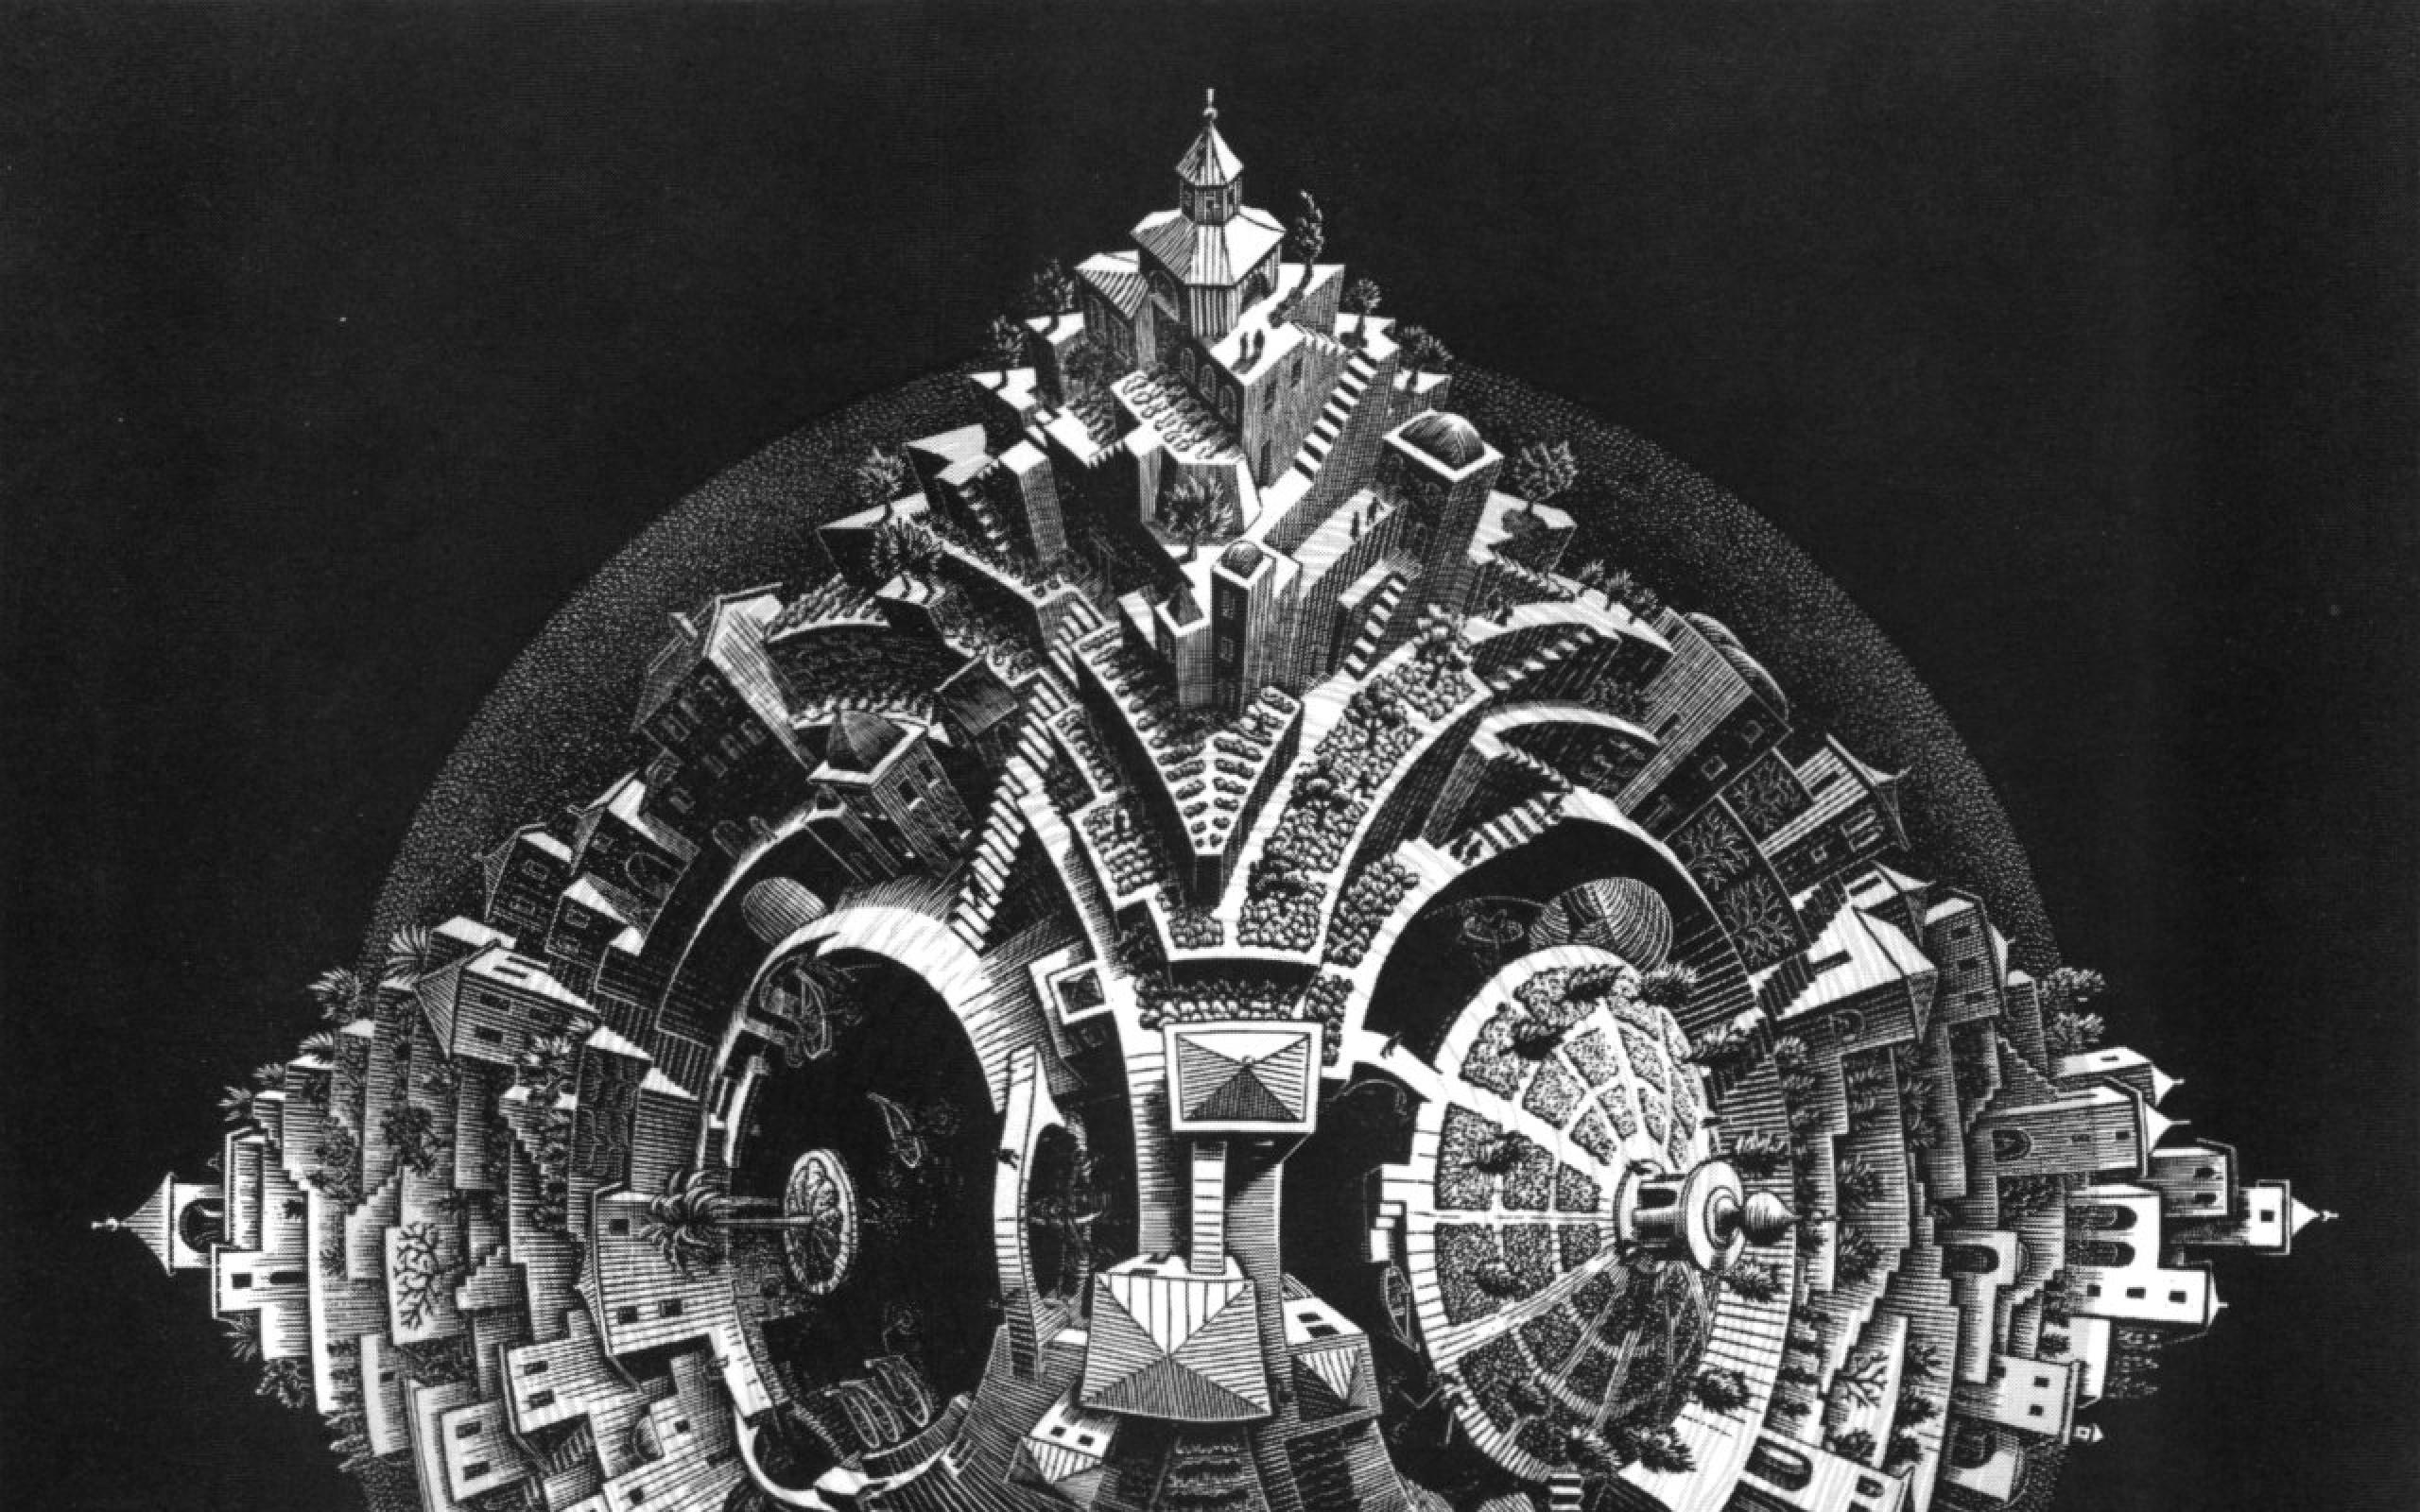 3d Optical Illusion Hd Wallpaper Mc Escher Wallpaper Hd 48 Images